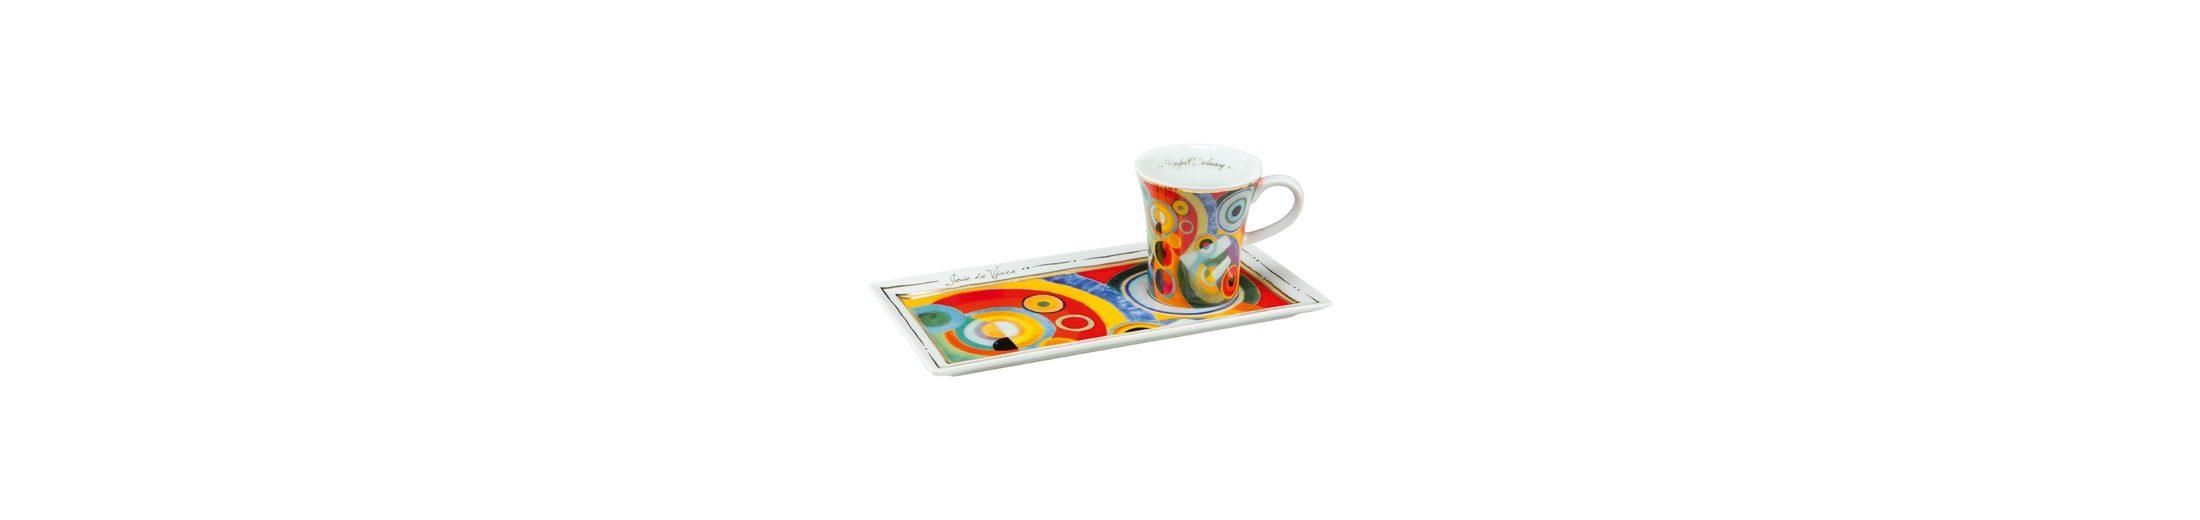 Goebel Lebensfreude - Espresso Set »Artis Orbis«